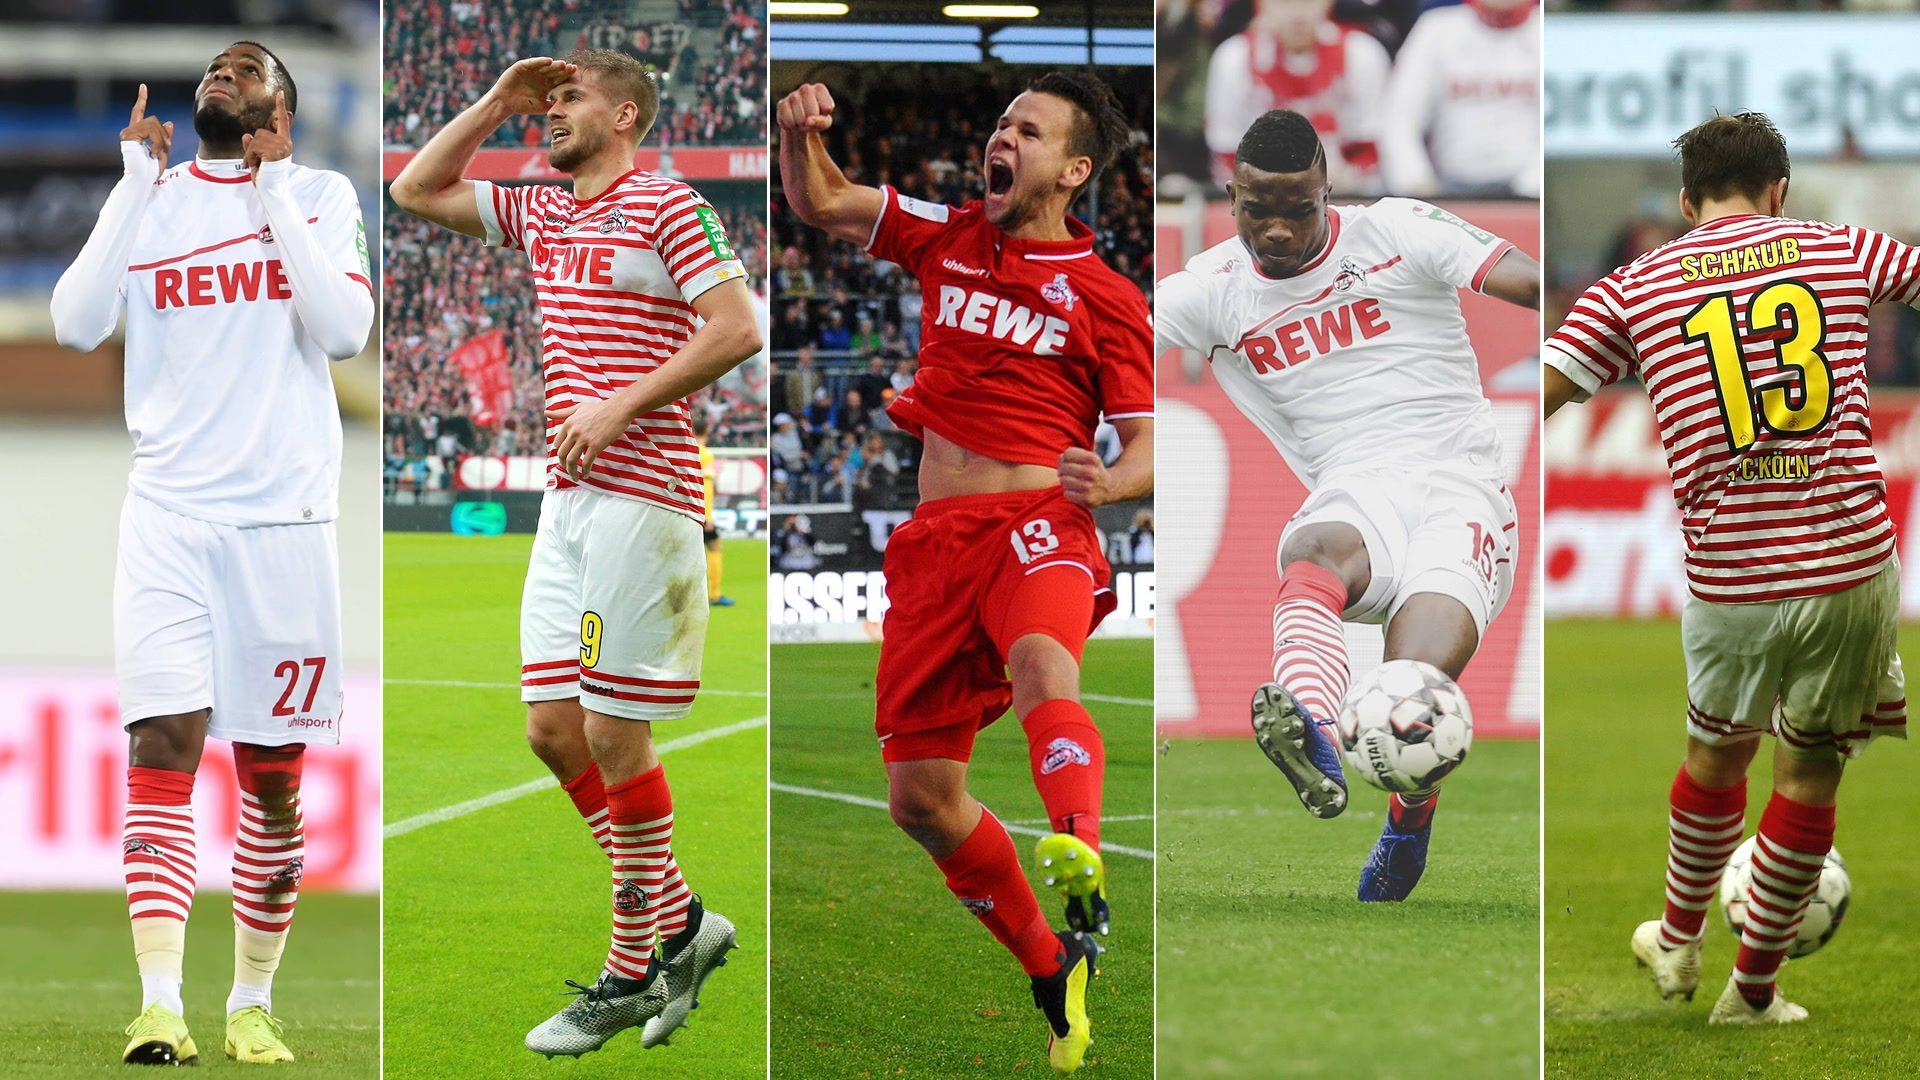 Fünf Top-Tore des 1. FC Köln